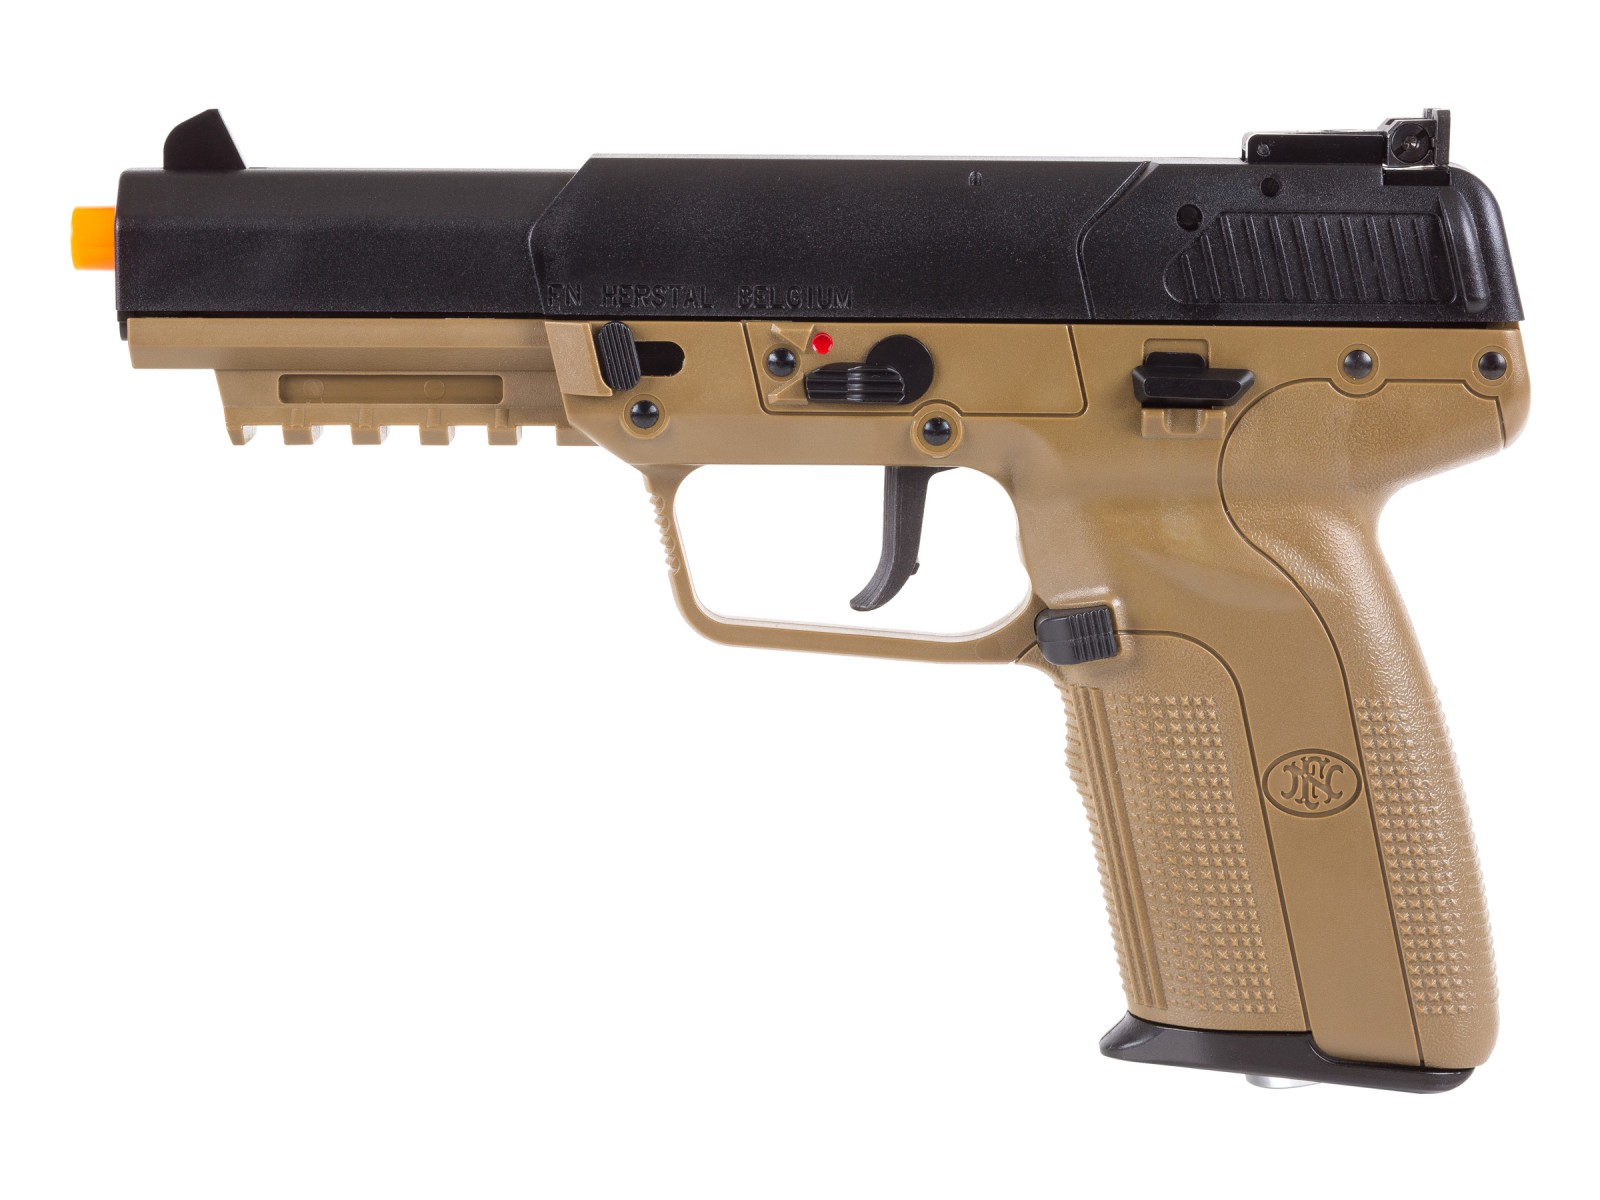 FN_Herstal_FiveSeven_CO2_Blowback_Airsoft_Pistol_TanBlack_6mm